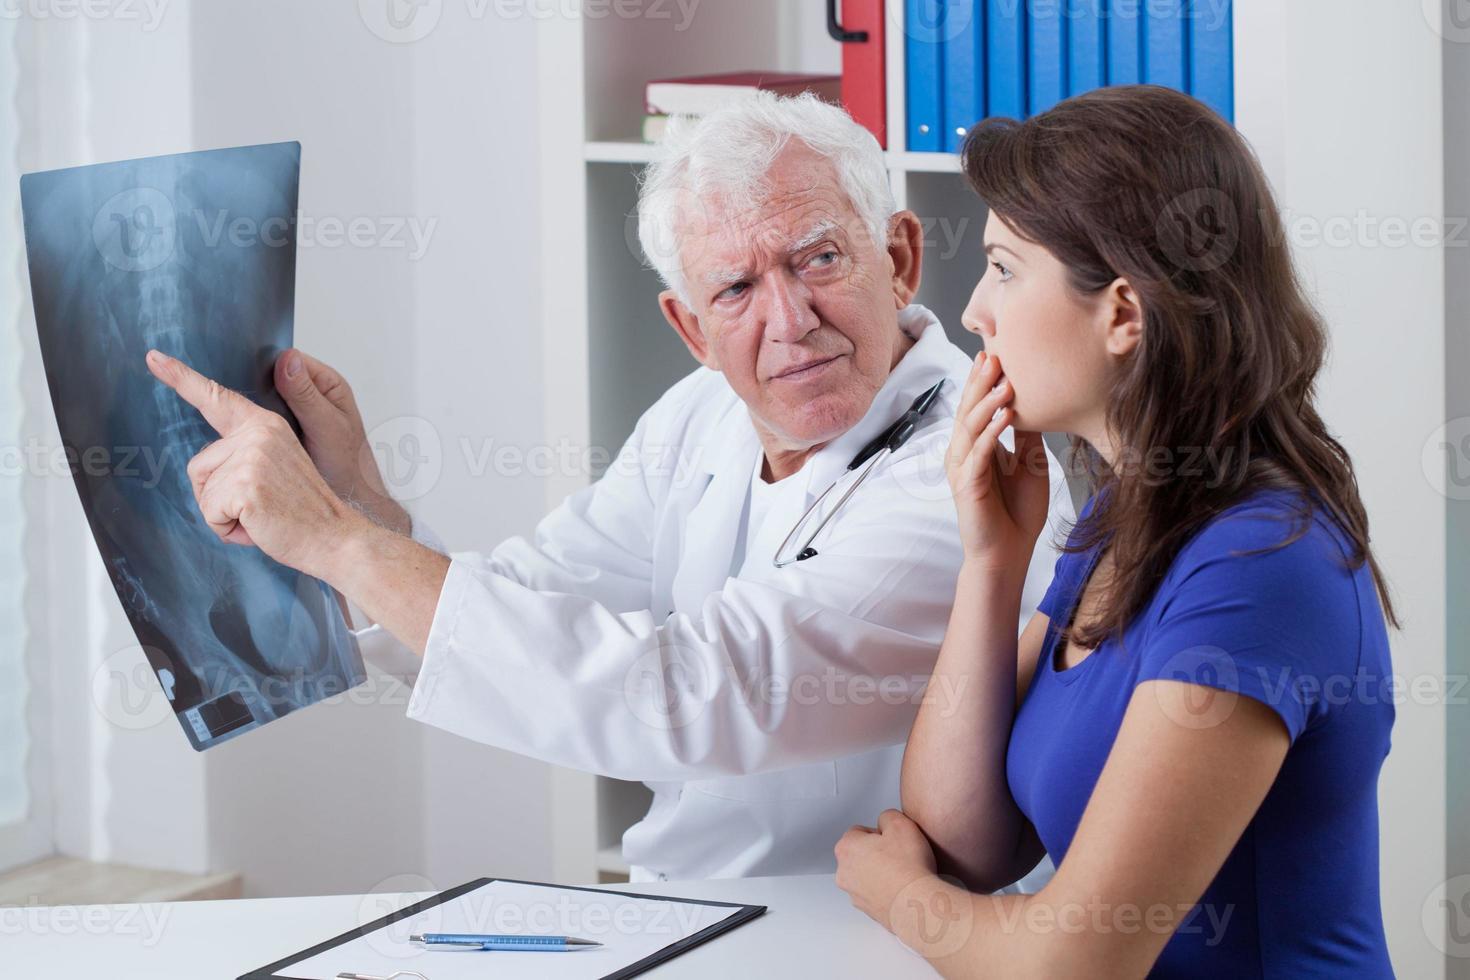 paciente preocupado foto